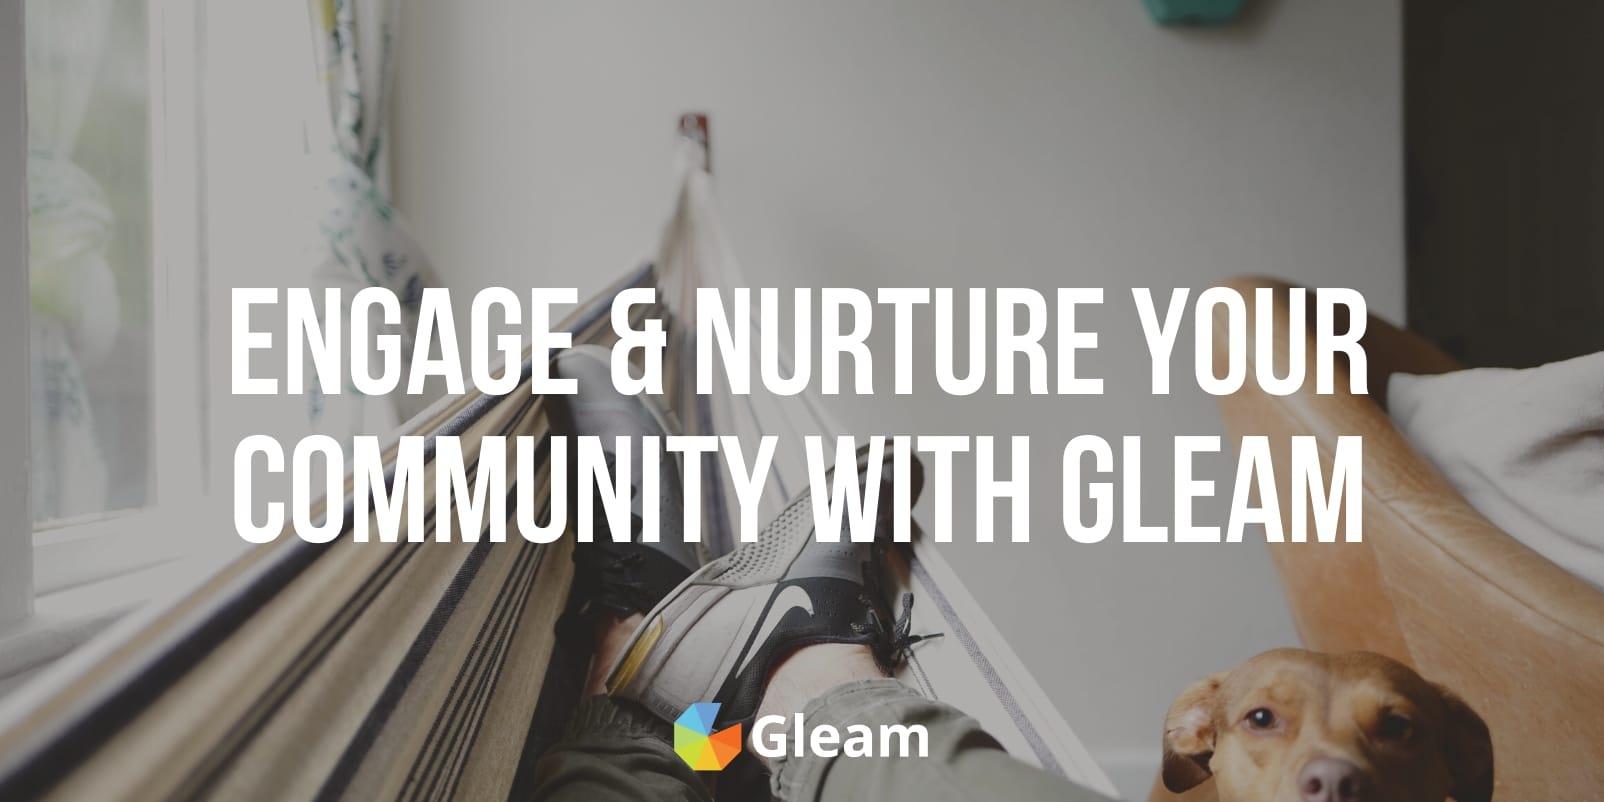 Engage & Nurture Your Community With Gleam